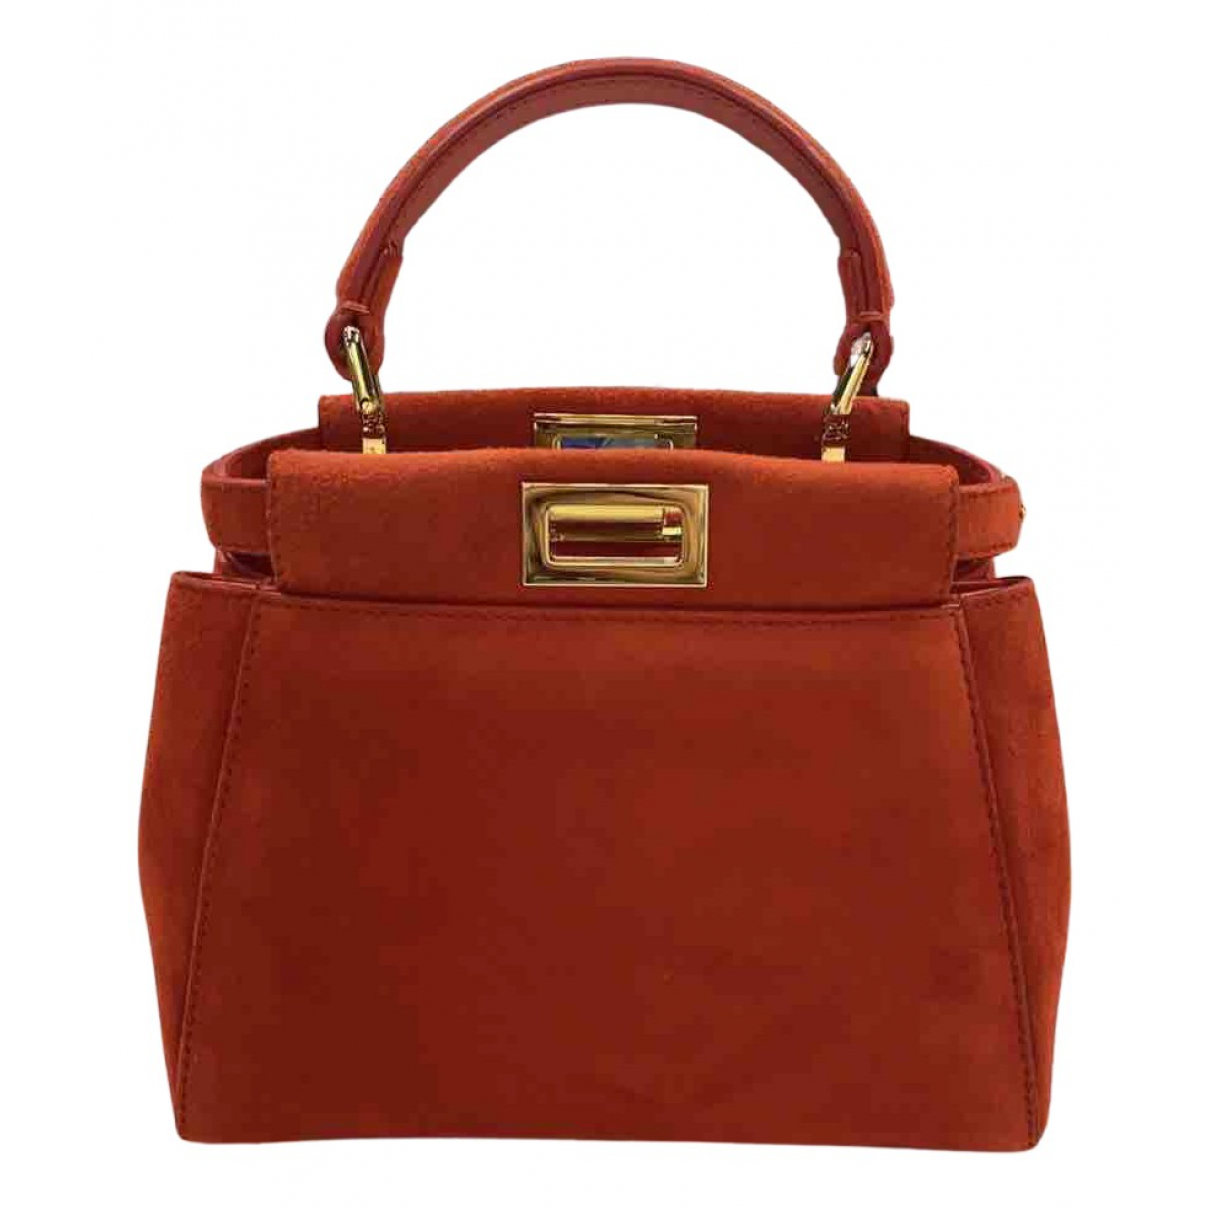 Fendi Peekaboo Orange Suede handbag for Women N